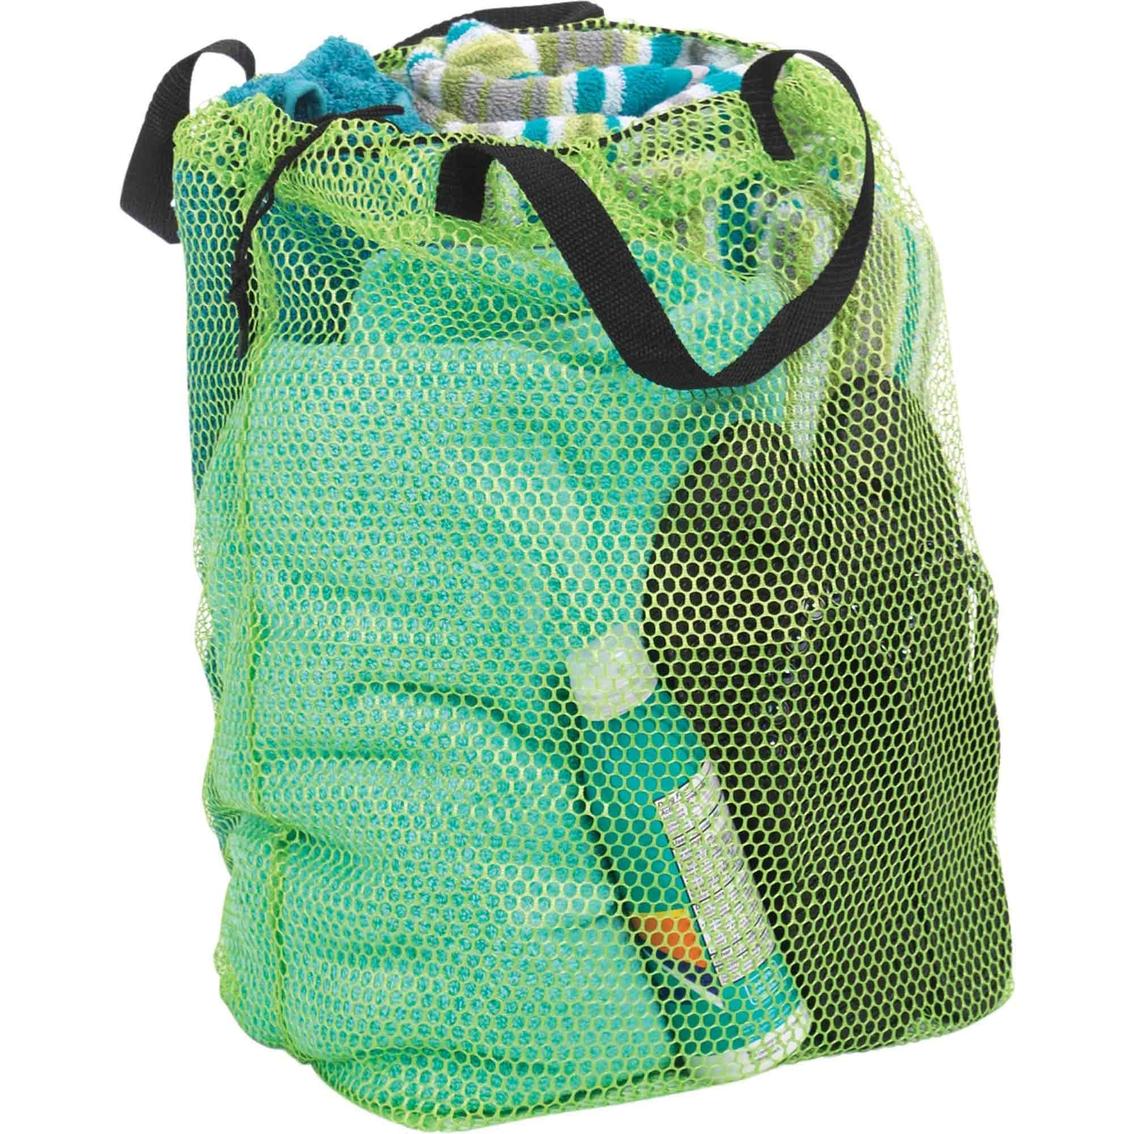 Homz Mesh Laundry Tote Bag Laundry Home Amp Appliances